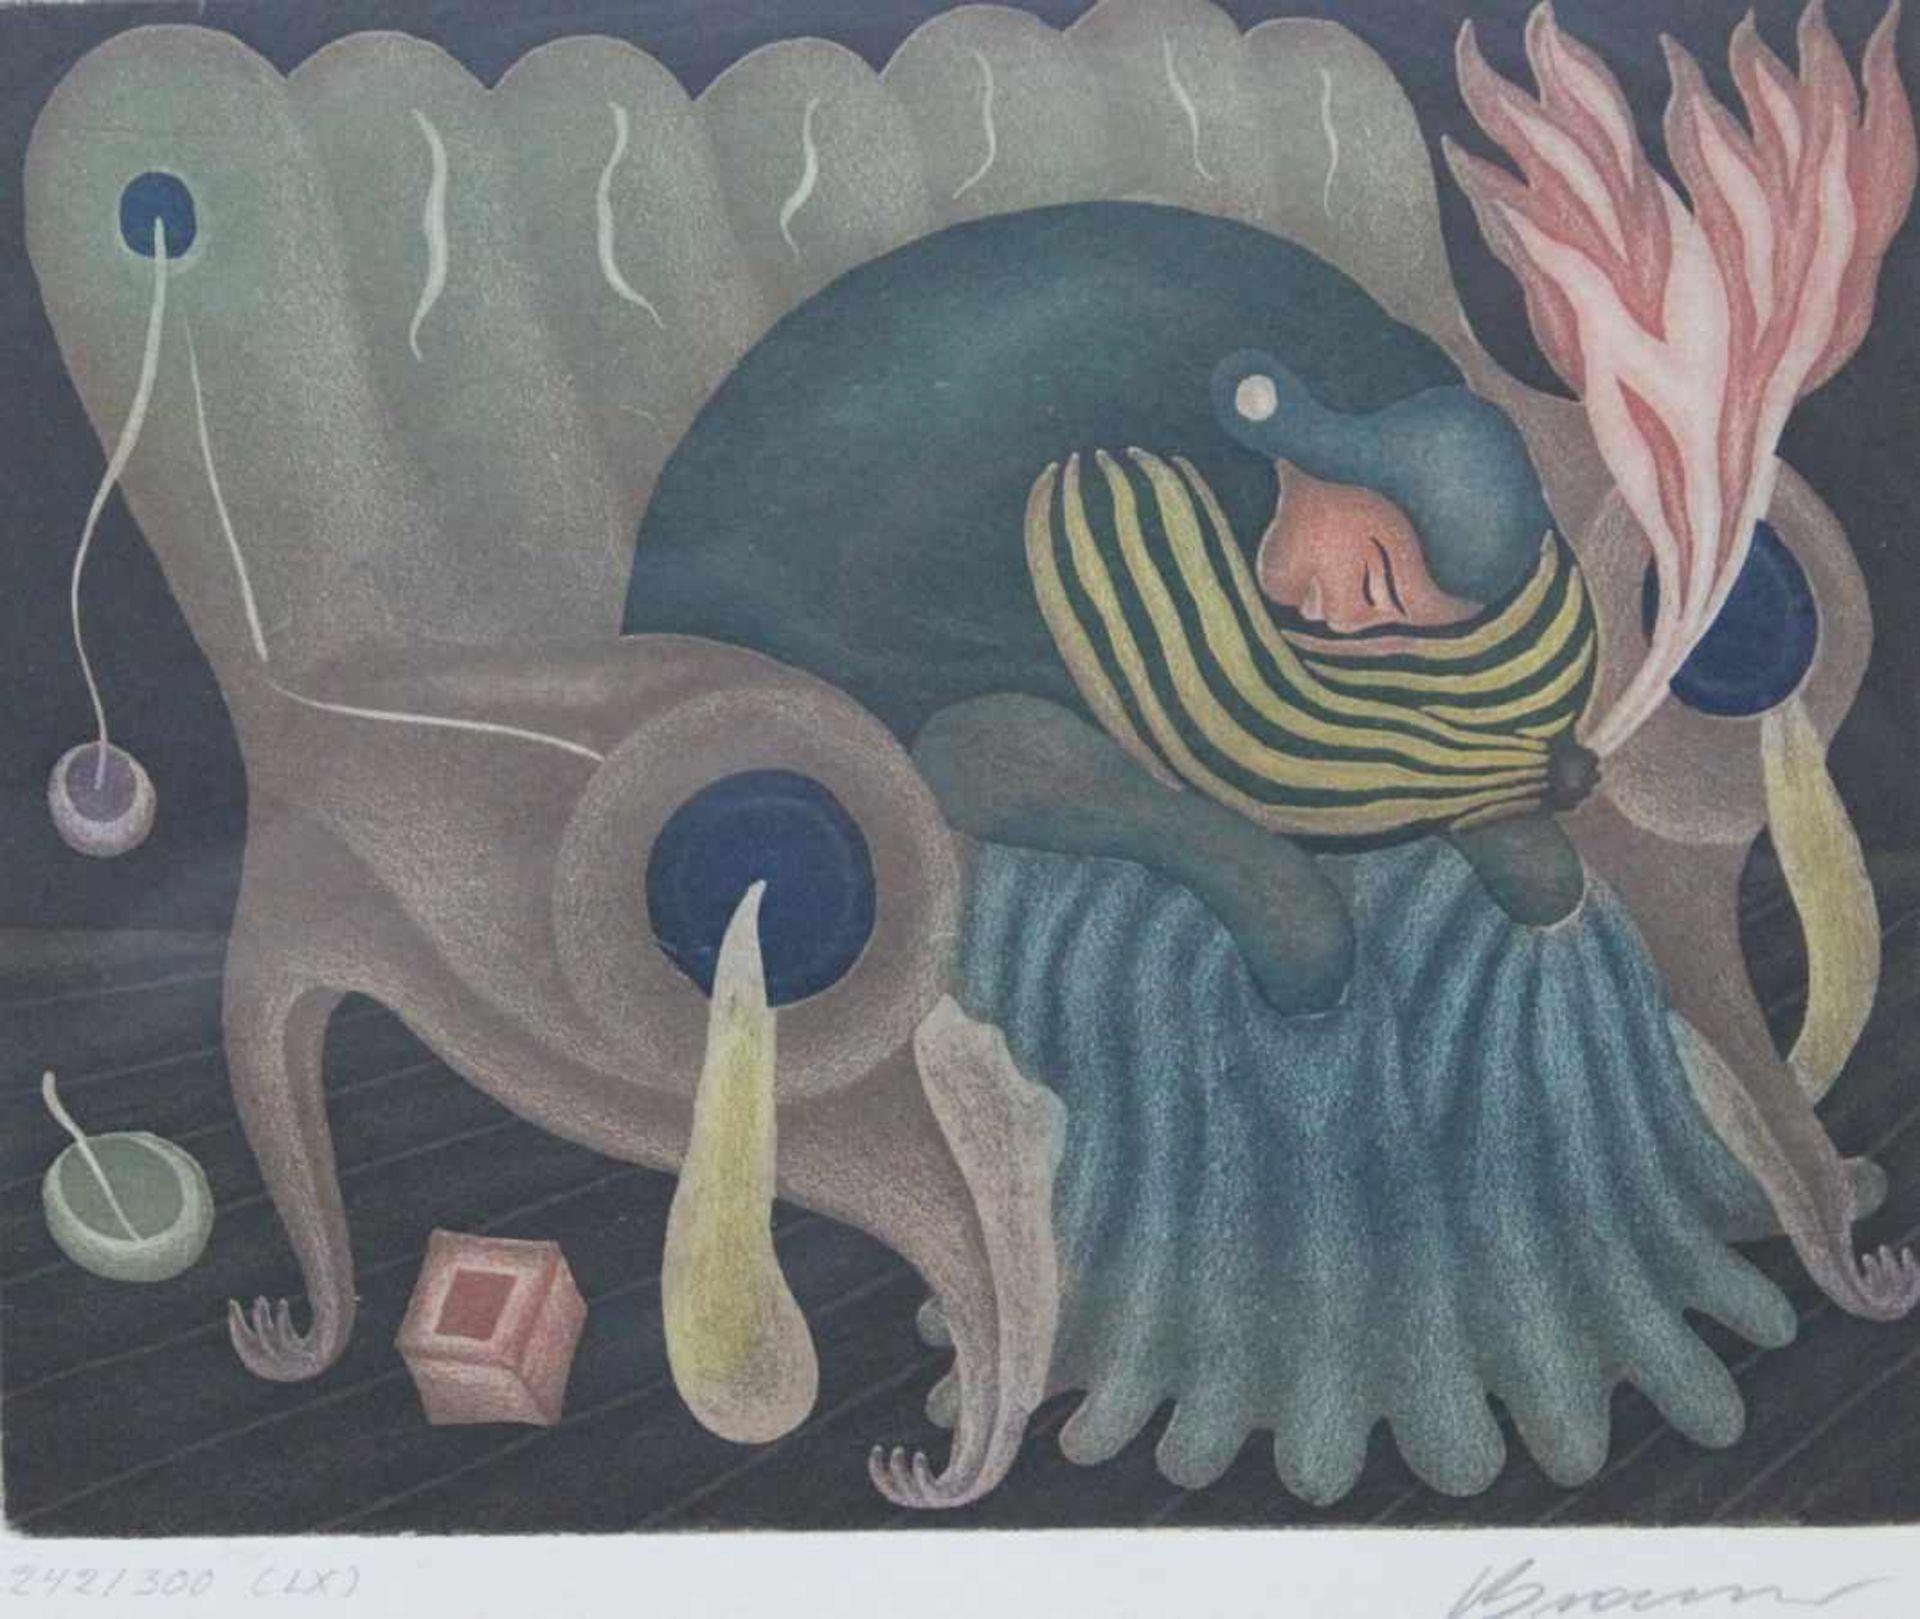 "Los 11 - Farbradierung - Arik Brauer (1929 Wien) ""Ohne Titel"", r.u. Bleistiftsignatur, Nr. 242/300 (LX),"